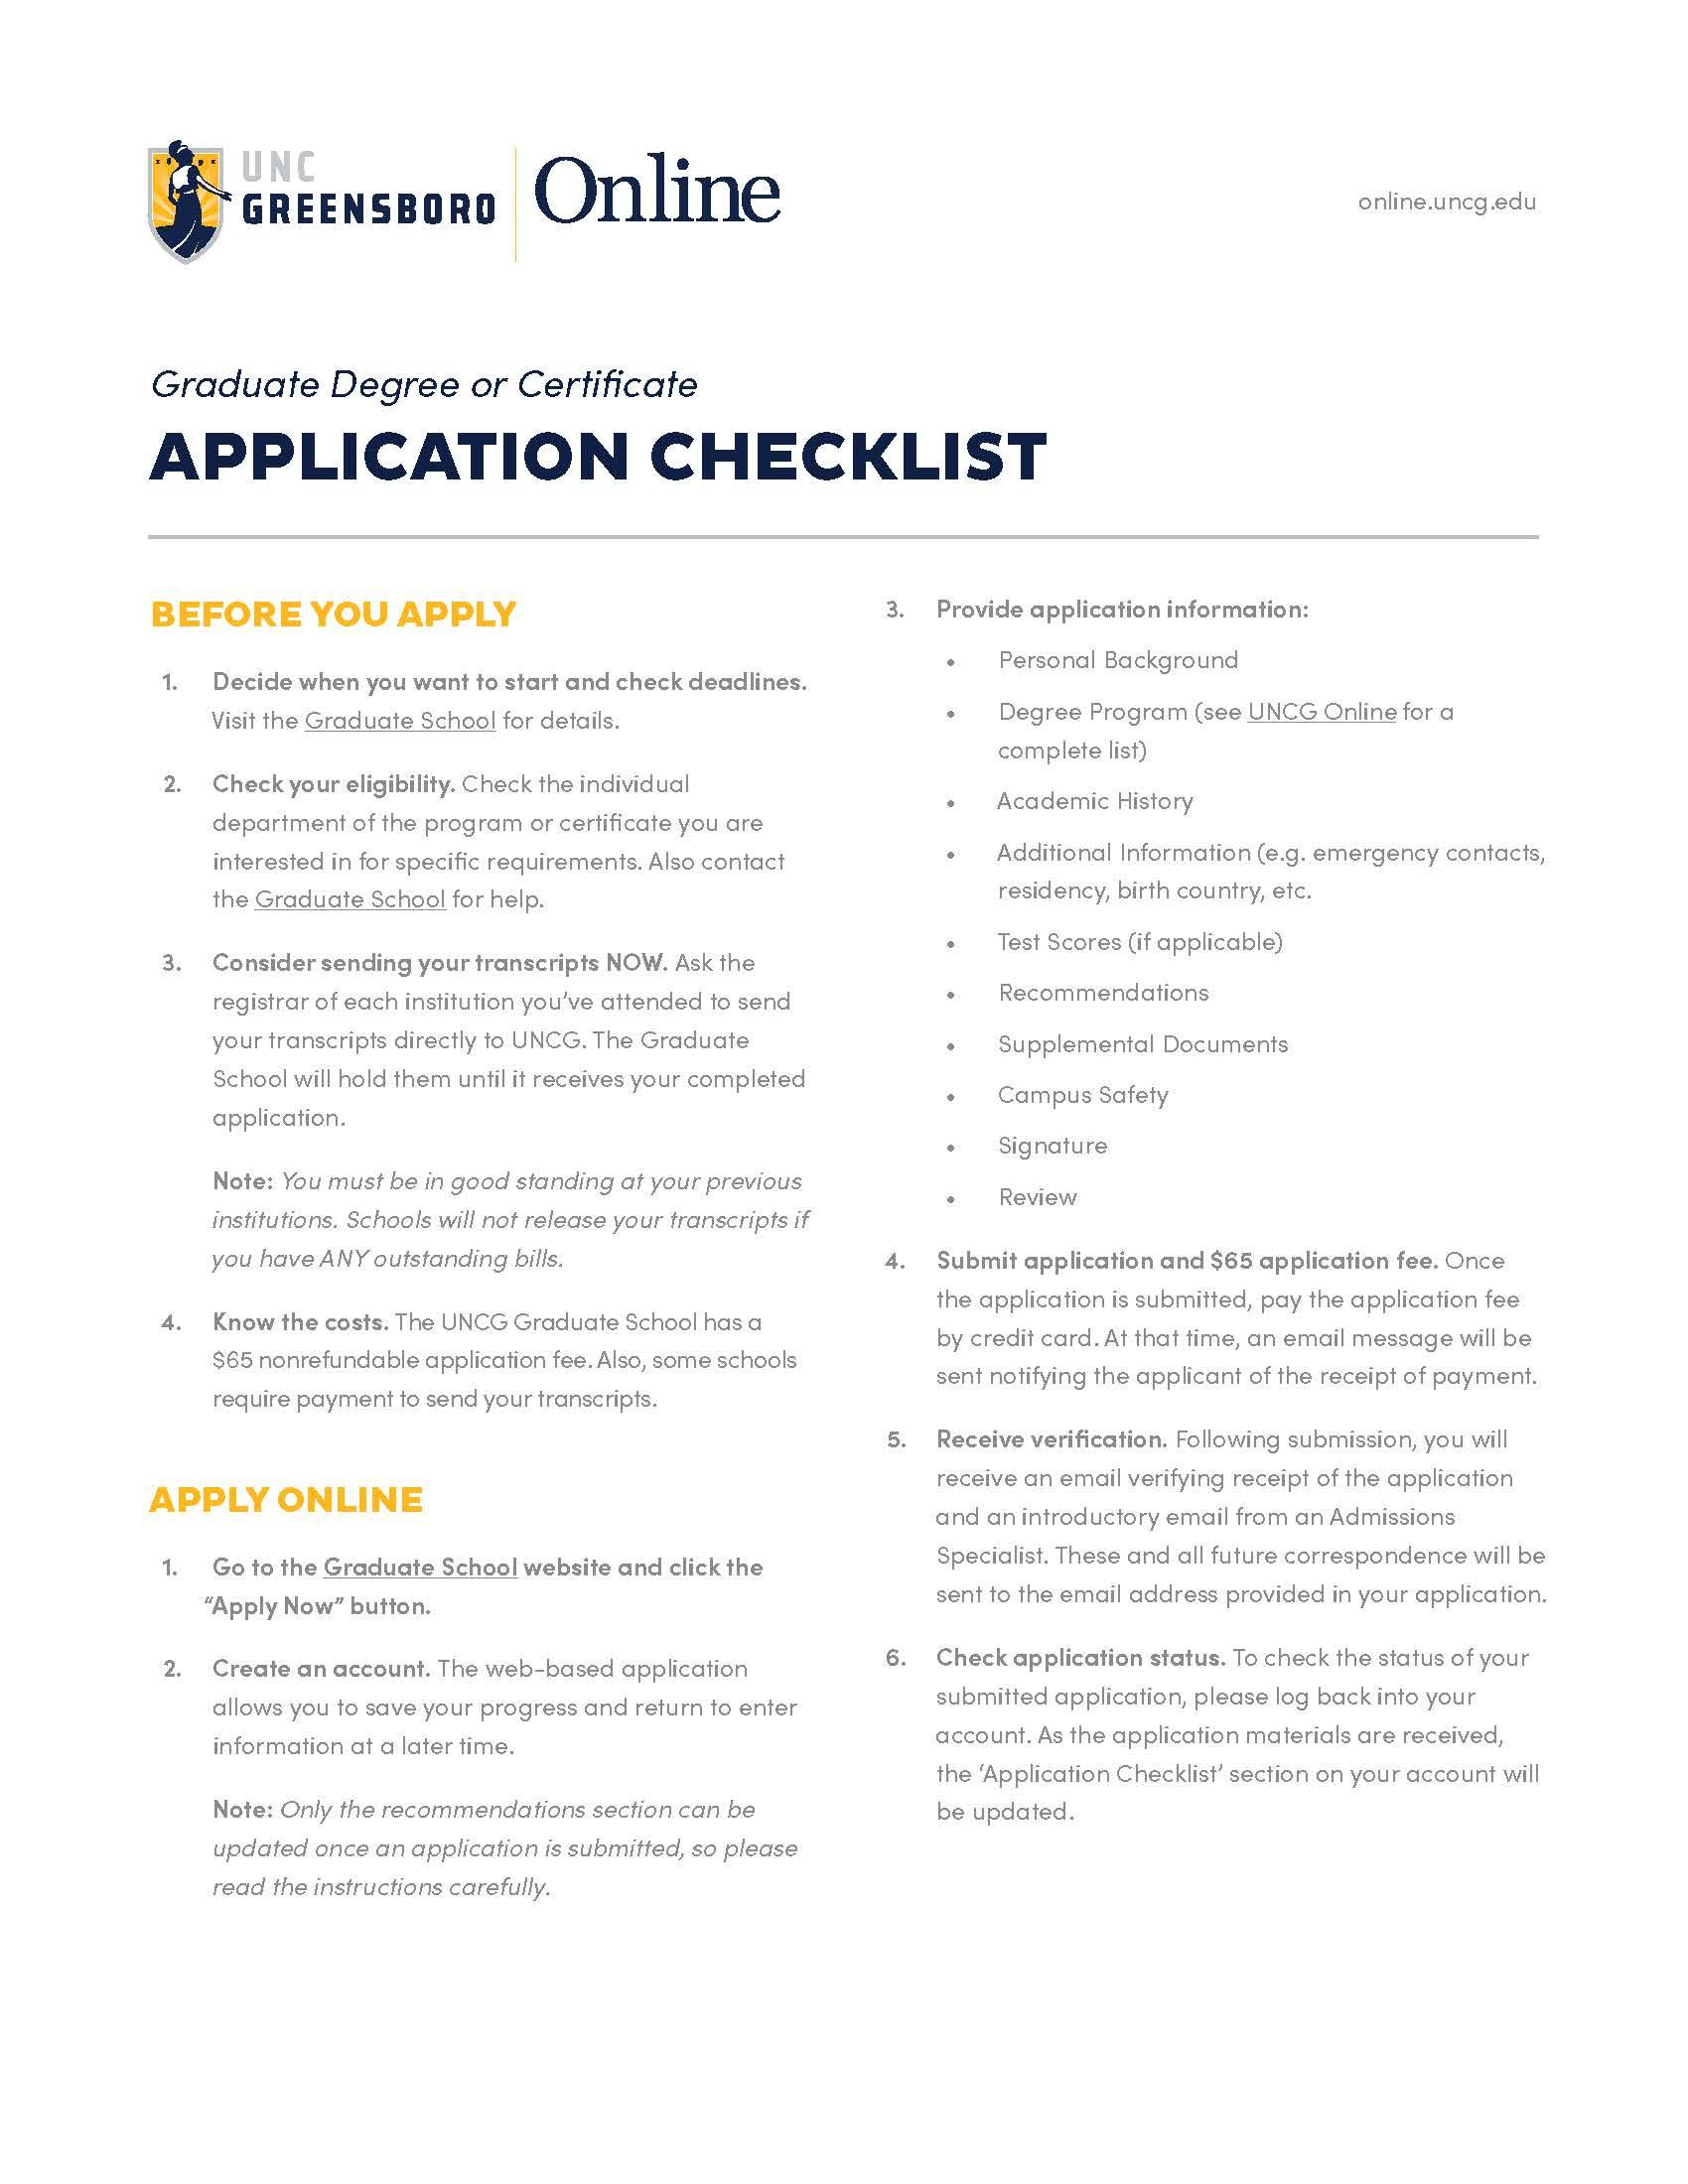 UO GR Application Checklist Thumb